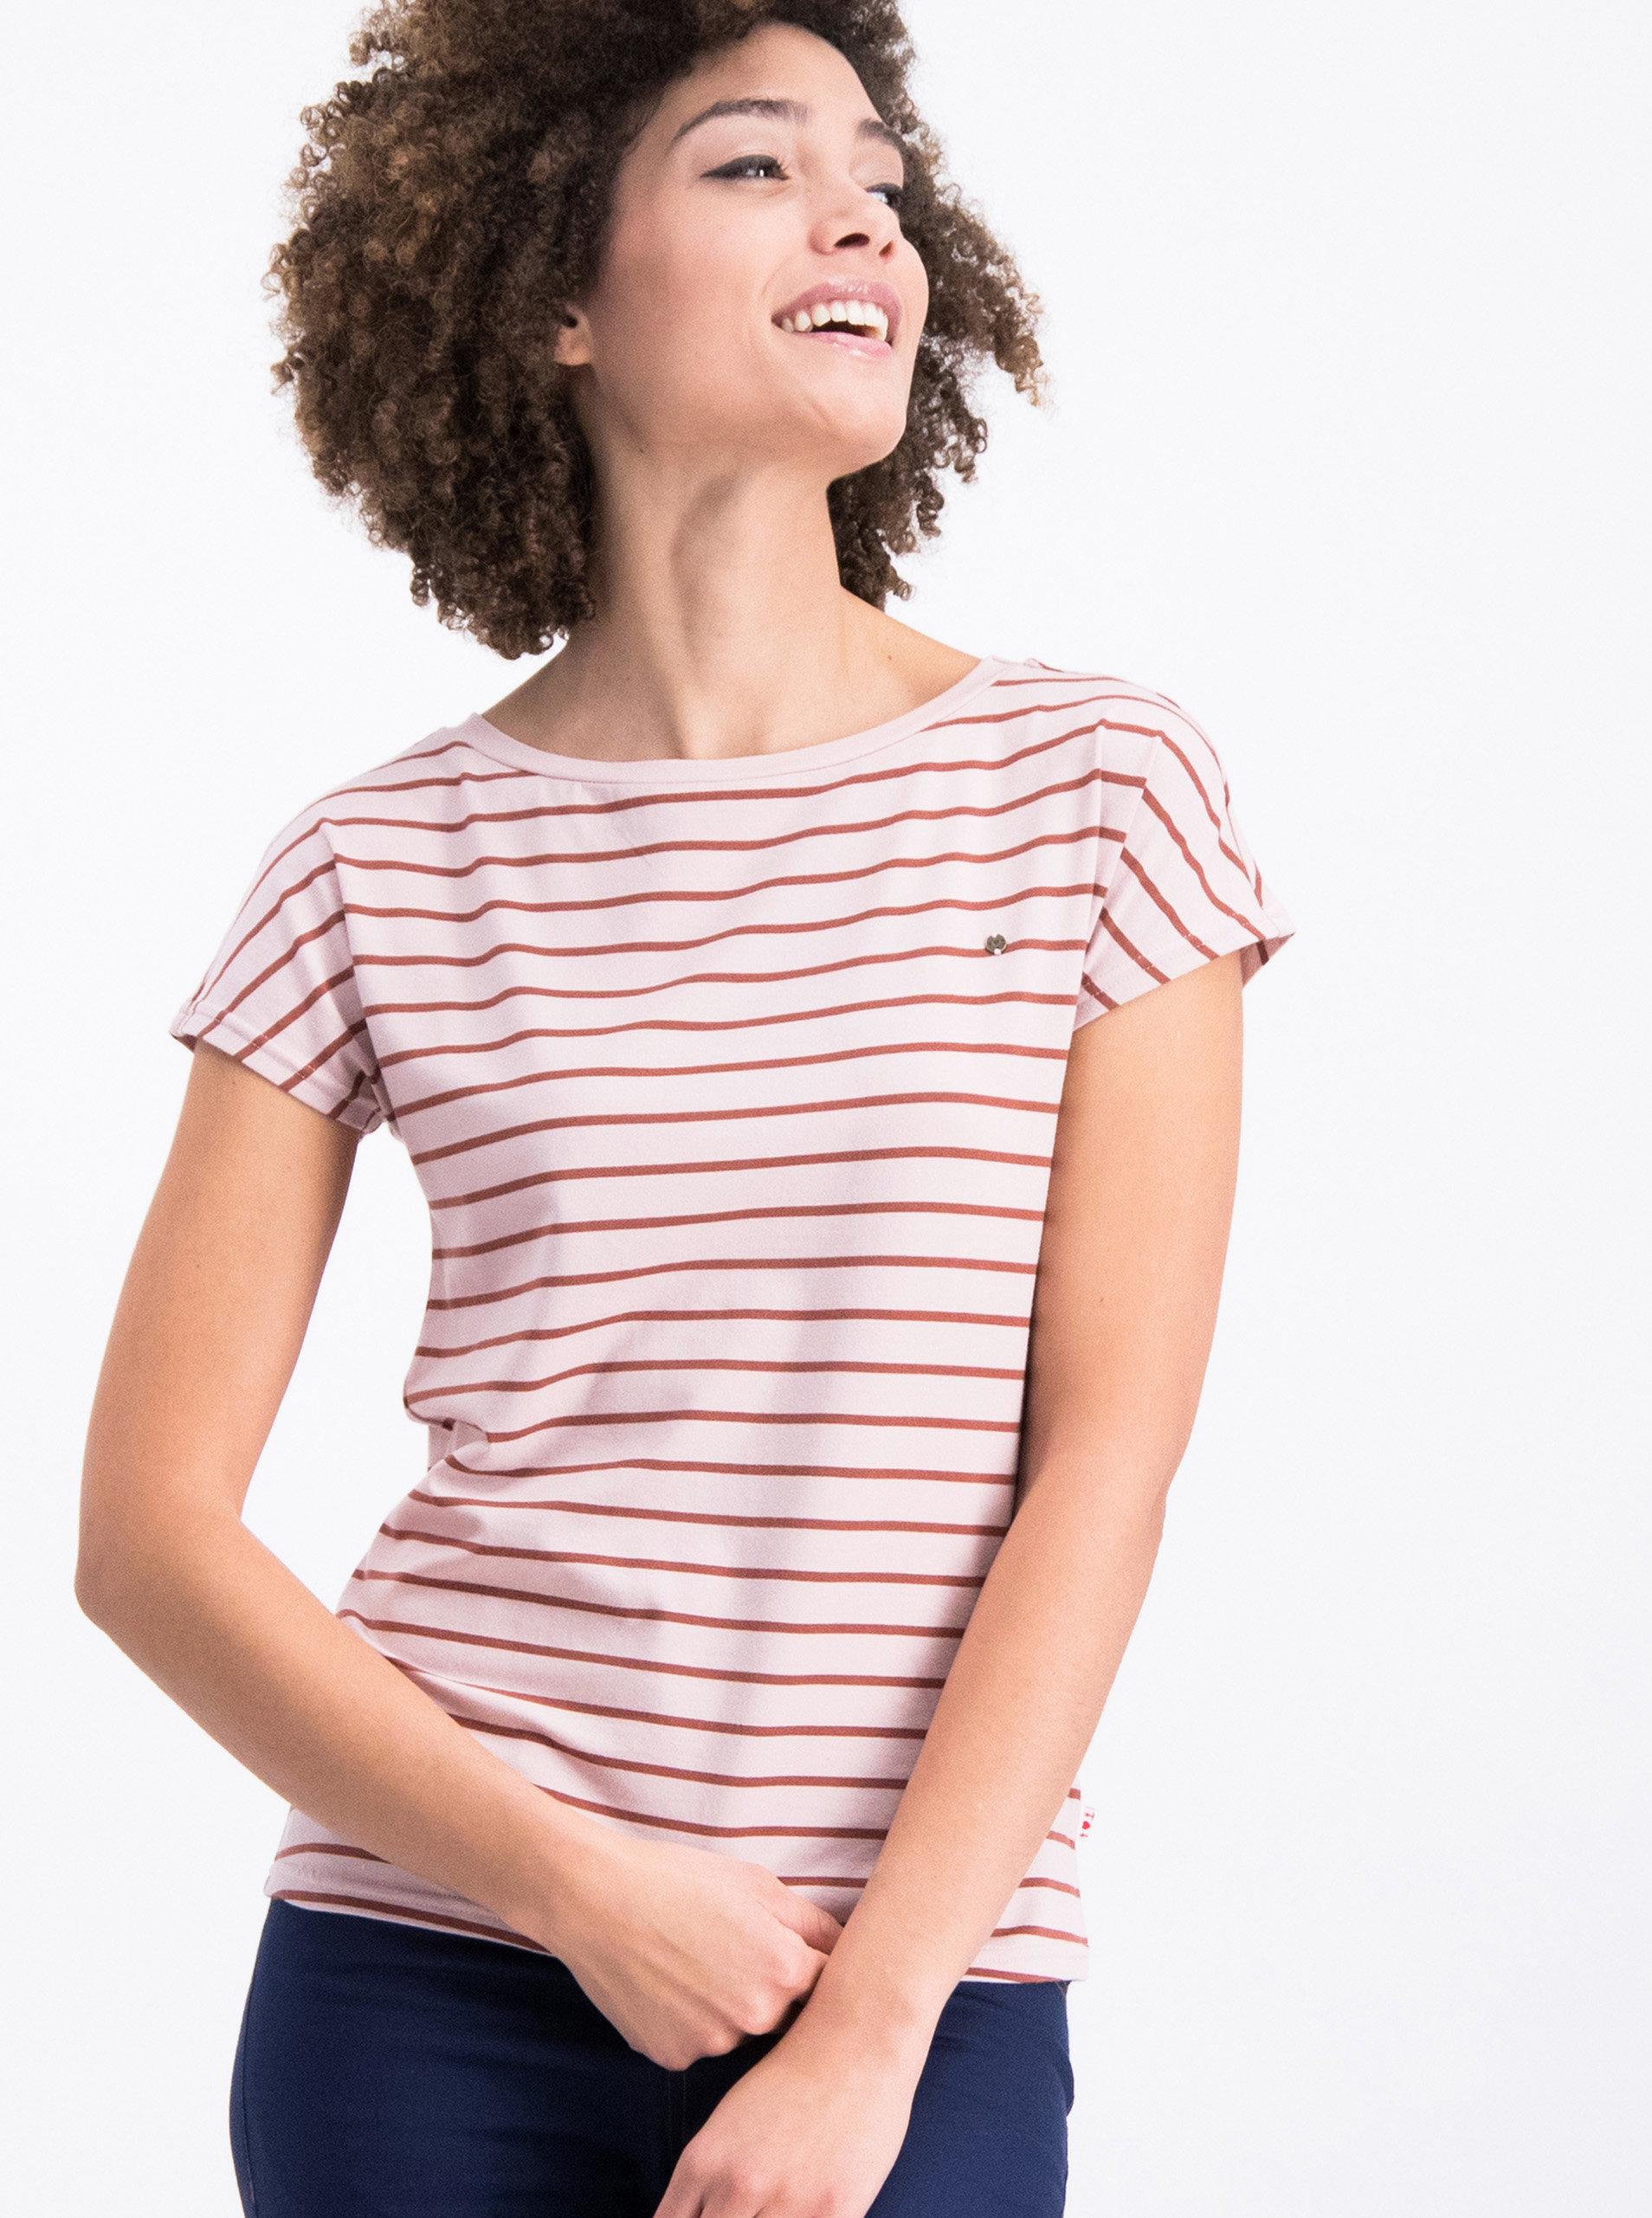 ce8126b5b Staroružové tričko s krátkym rukávom Blutsgeschwister | ZOOT.sk